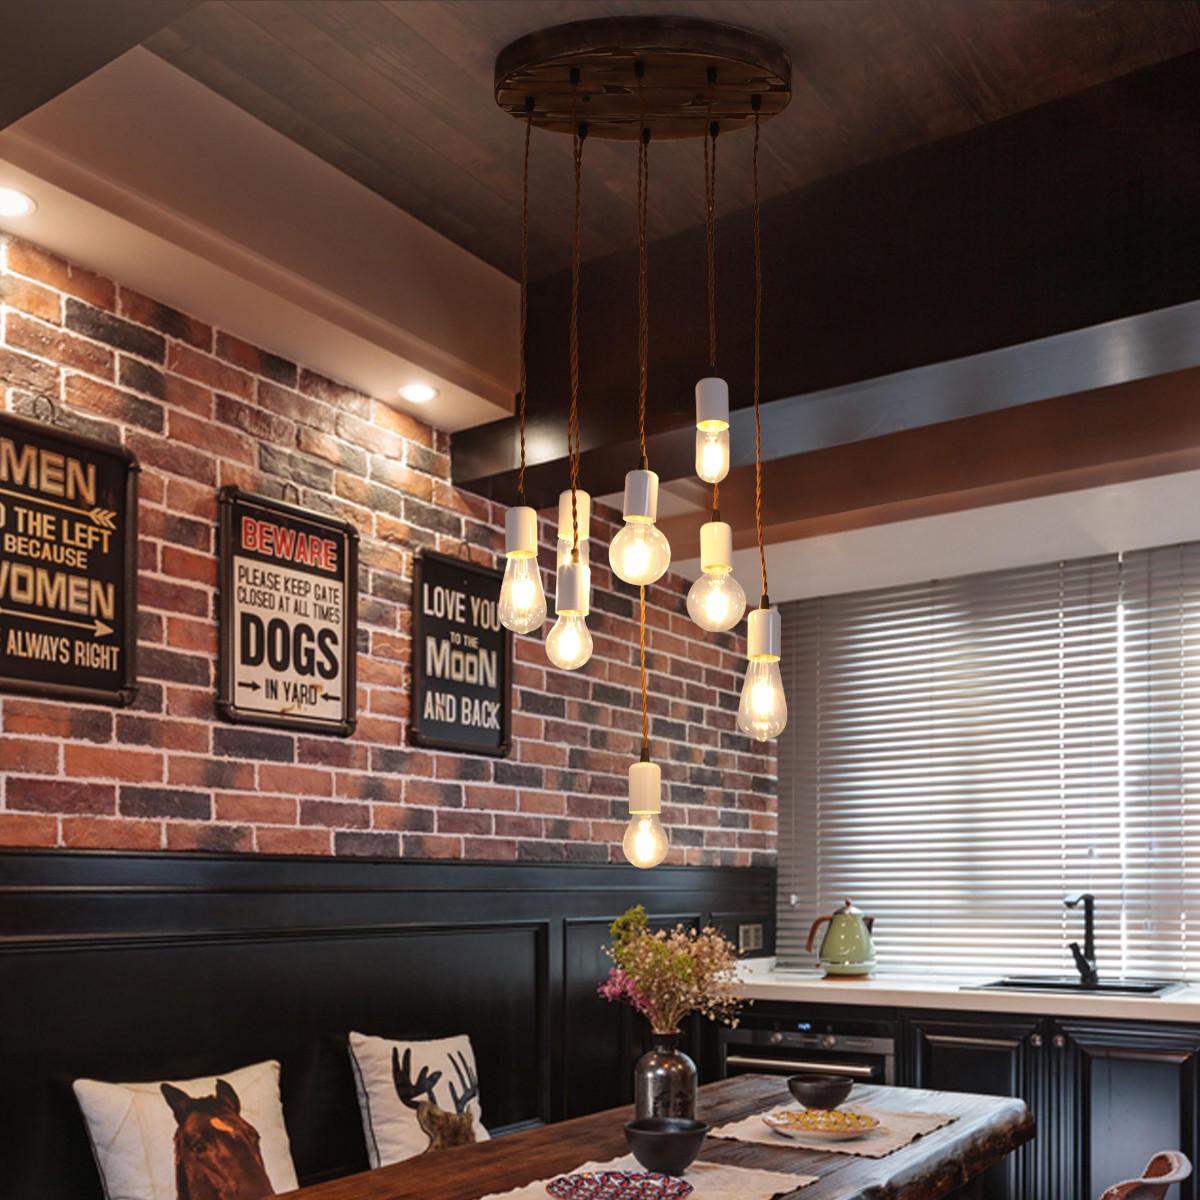 E27 Modern Pendant Light Ceiling Lamp Chandelier Bar Home Kitchen Fixture  Decor